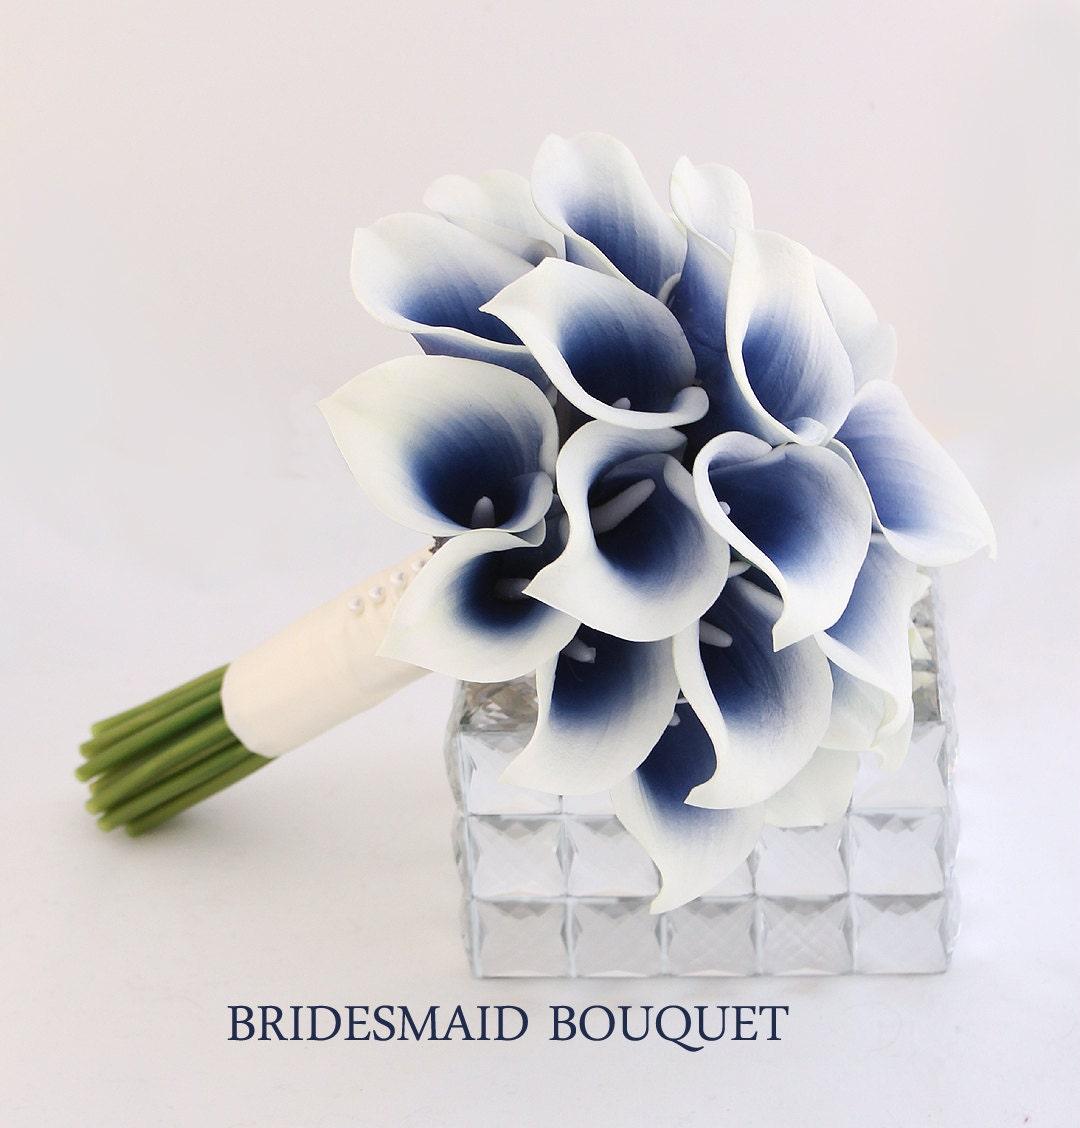 navy wedding flowers bridesmaid bouquet navy blue bouquet. Black Bedroom Furniture Sets. Home Design Ideas